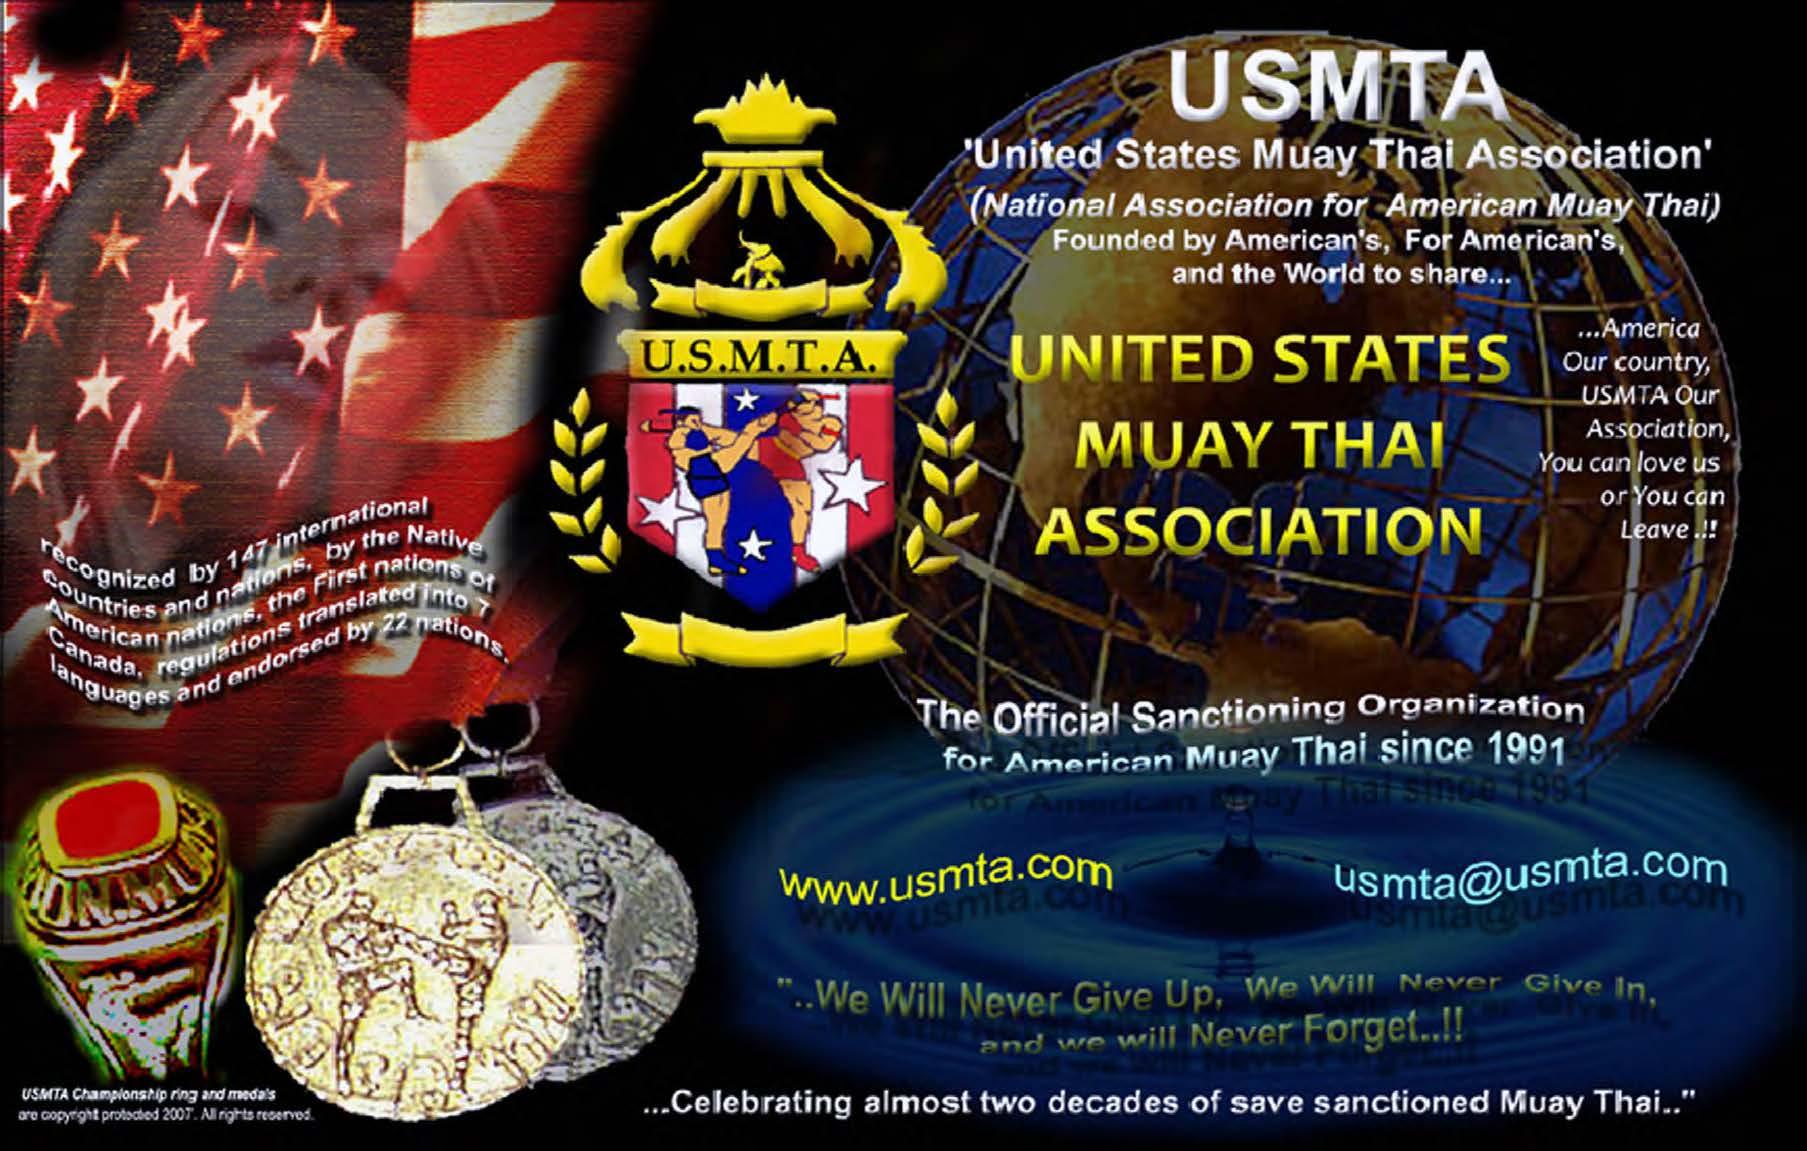 usmta-banner-1